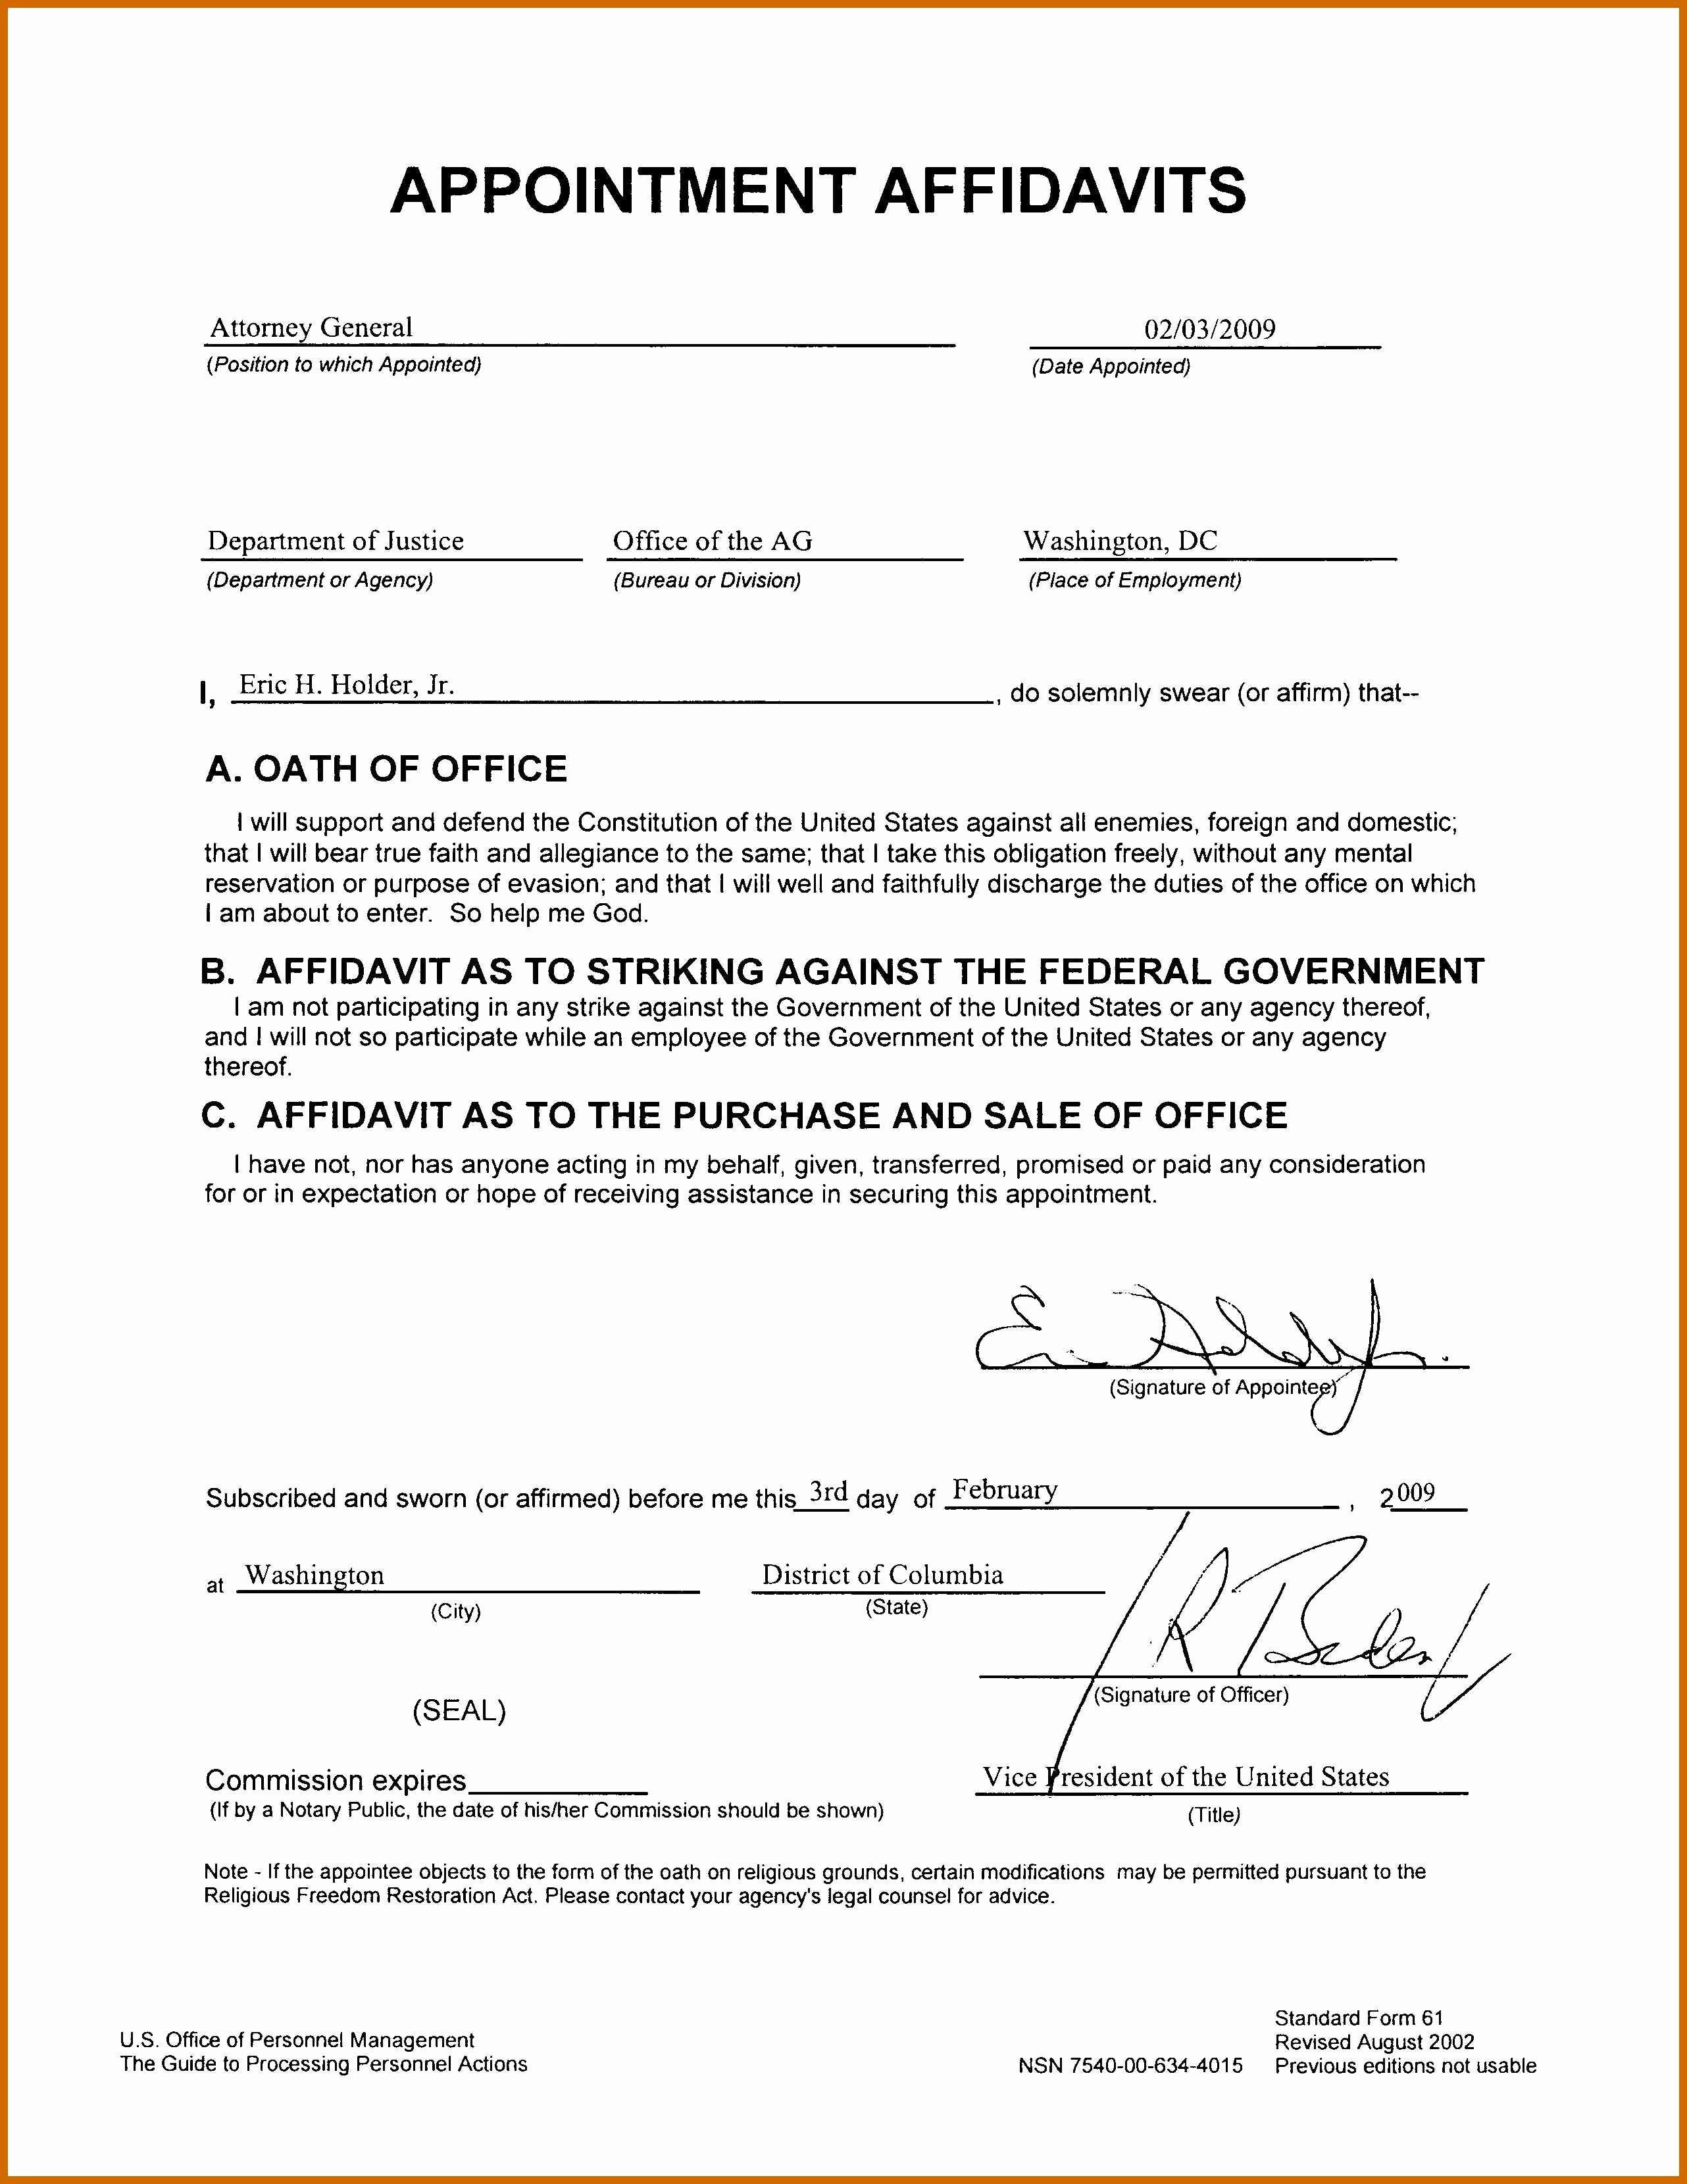 Affidavit Of Support Template Letter Beautiful 3 4 Affidavit Sample Letter